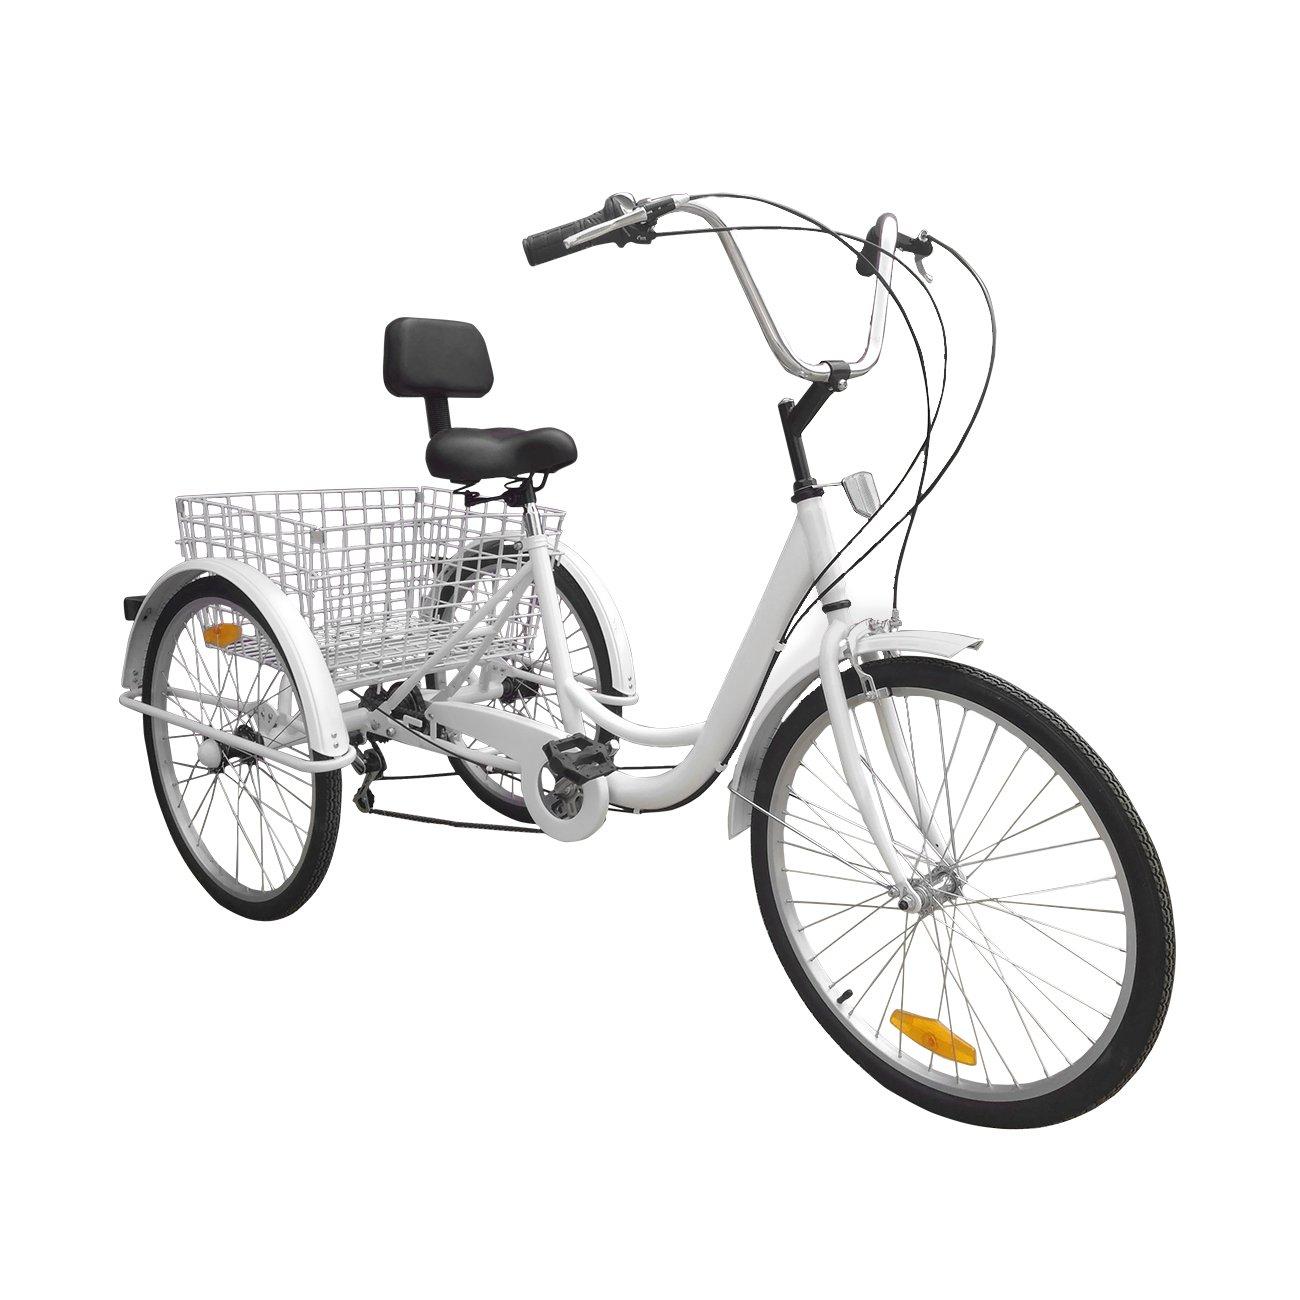 Bici a 3 ruote Urban Paneltech per adulti 6 velocitàe cestino03